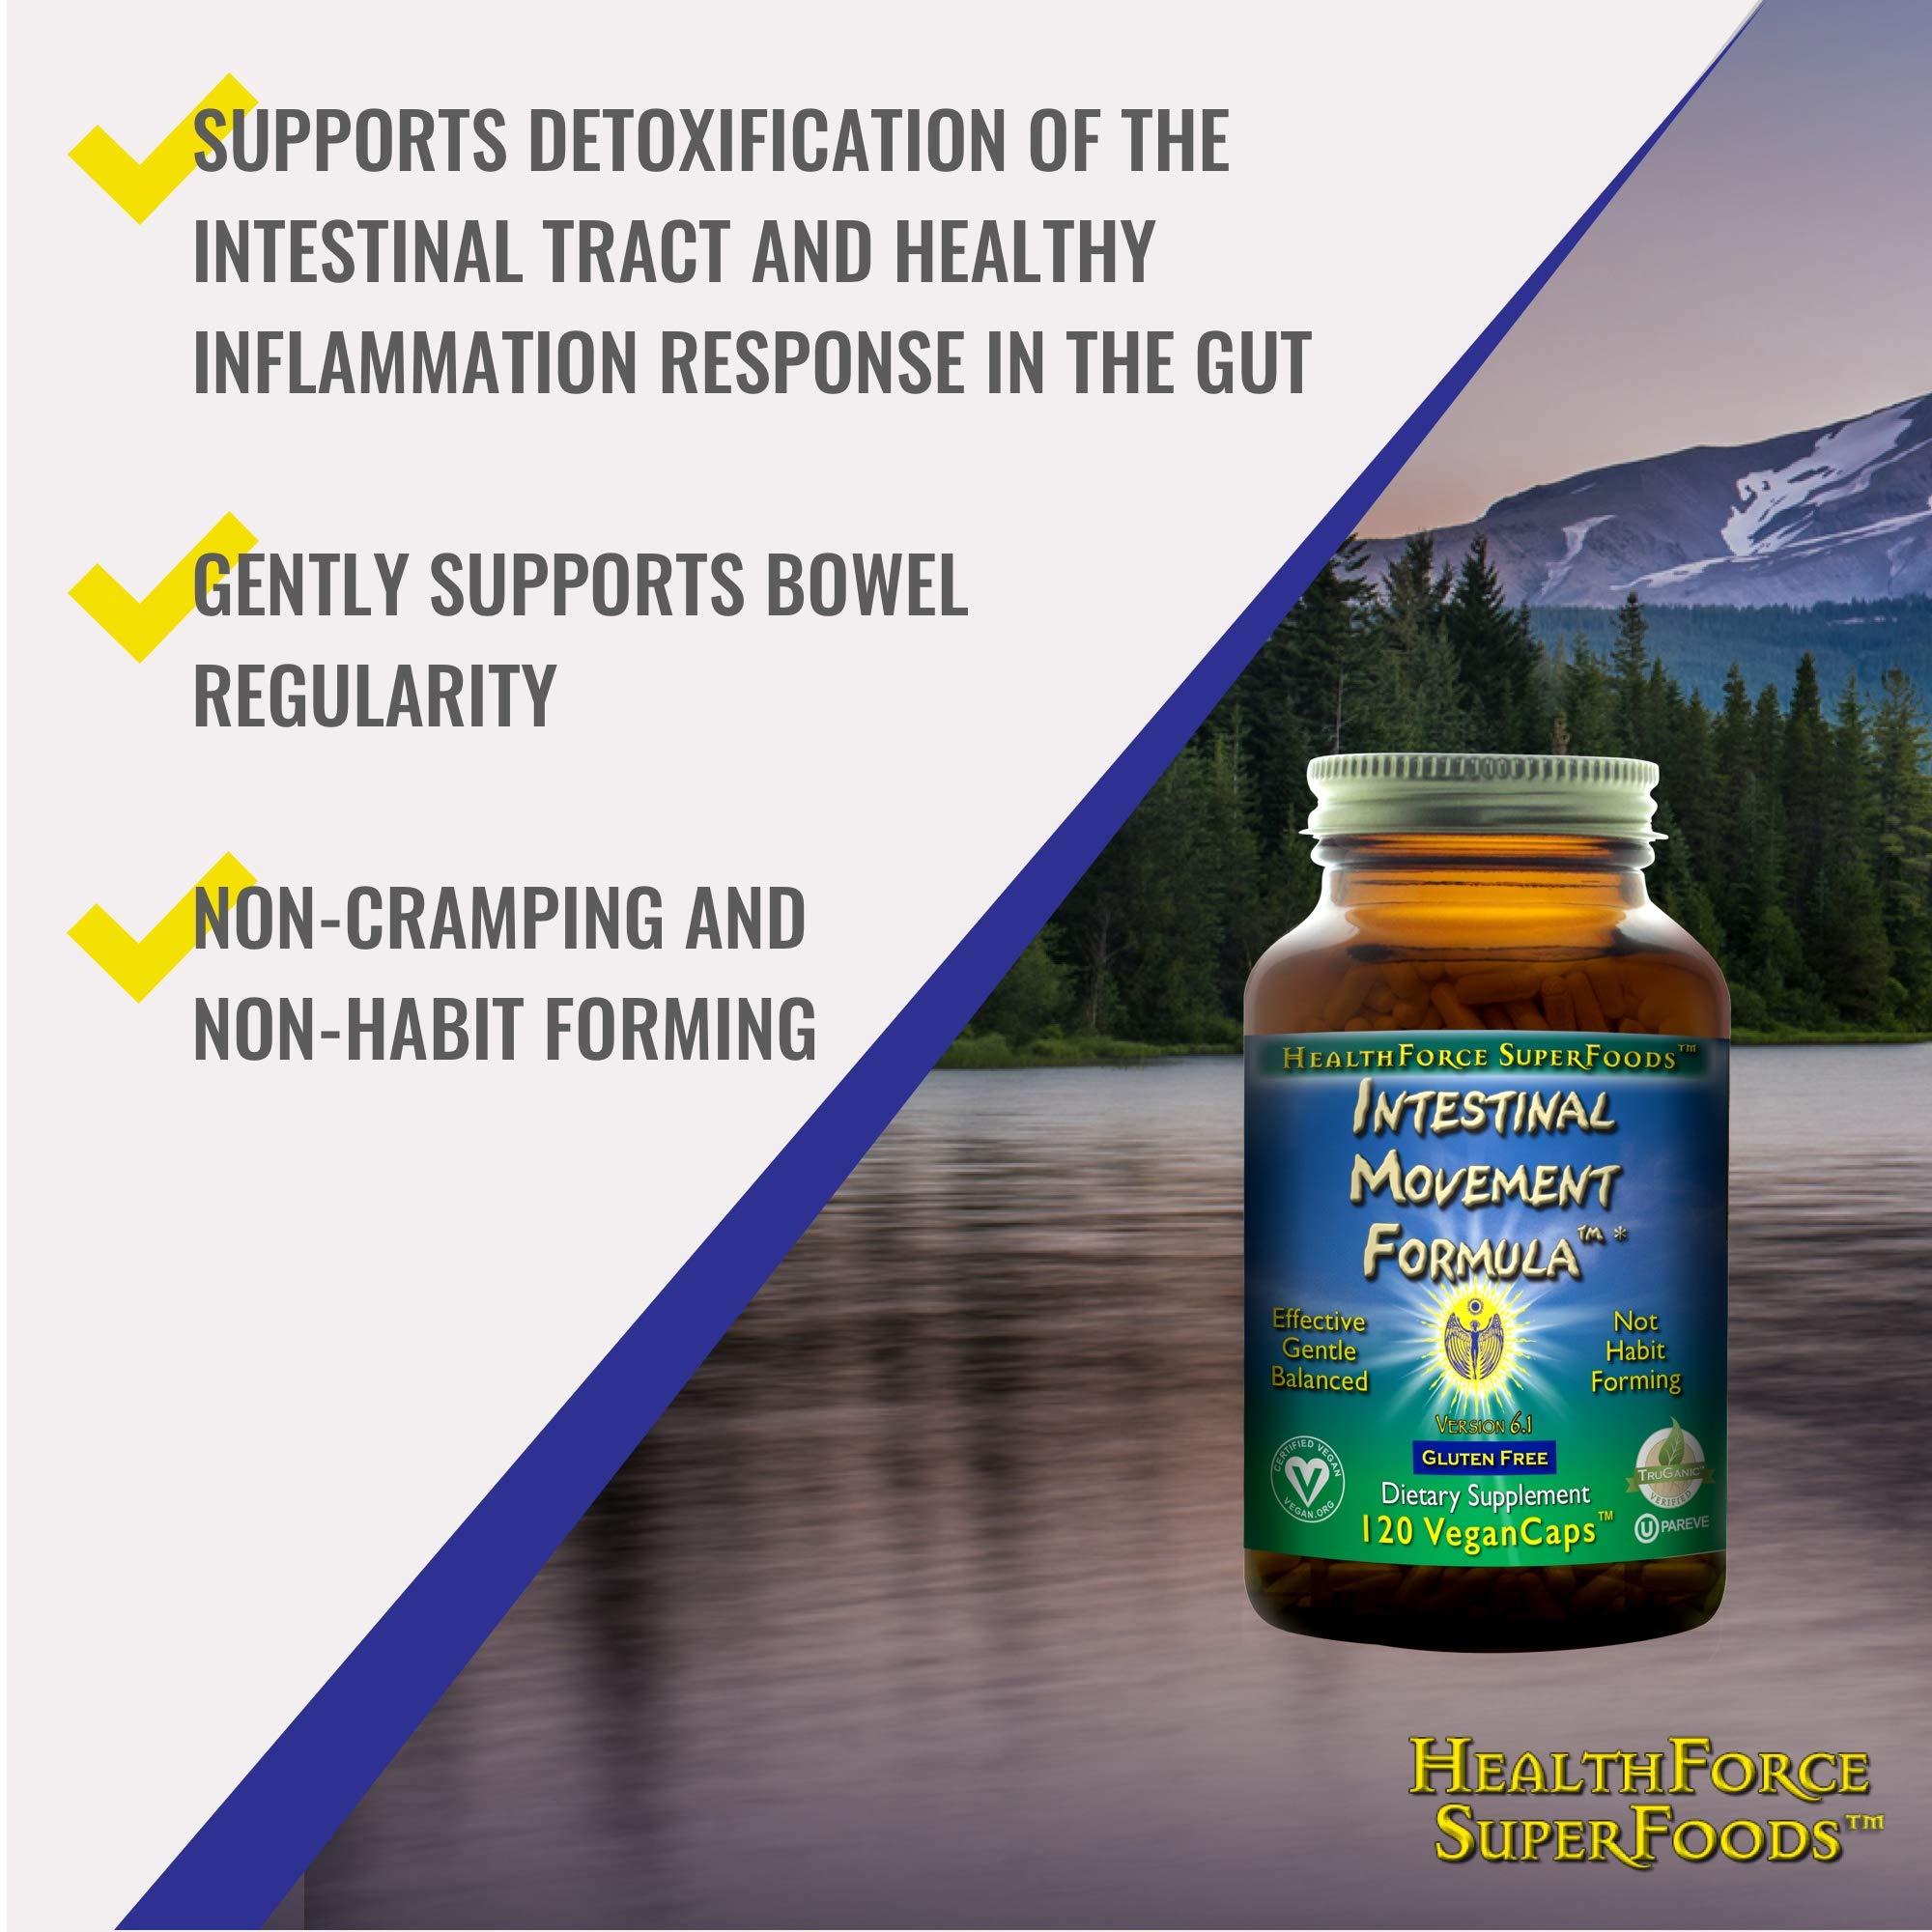 HealthForce SuperFoods Intestinal Movement Formula, Herbal Laxative, All-Natural, Organic, Non-GMO, Gluten-Free, Kosher, Vegan, 120 Count by HEALTHFORCE SUPERFOODS (Image #3)